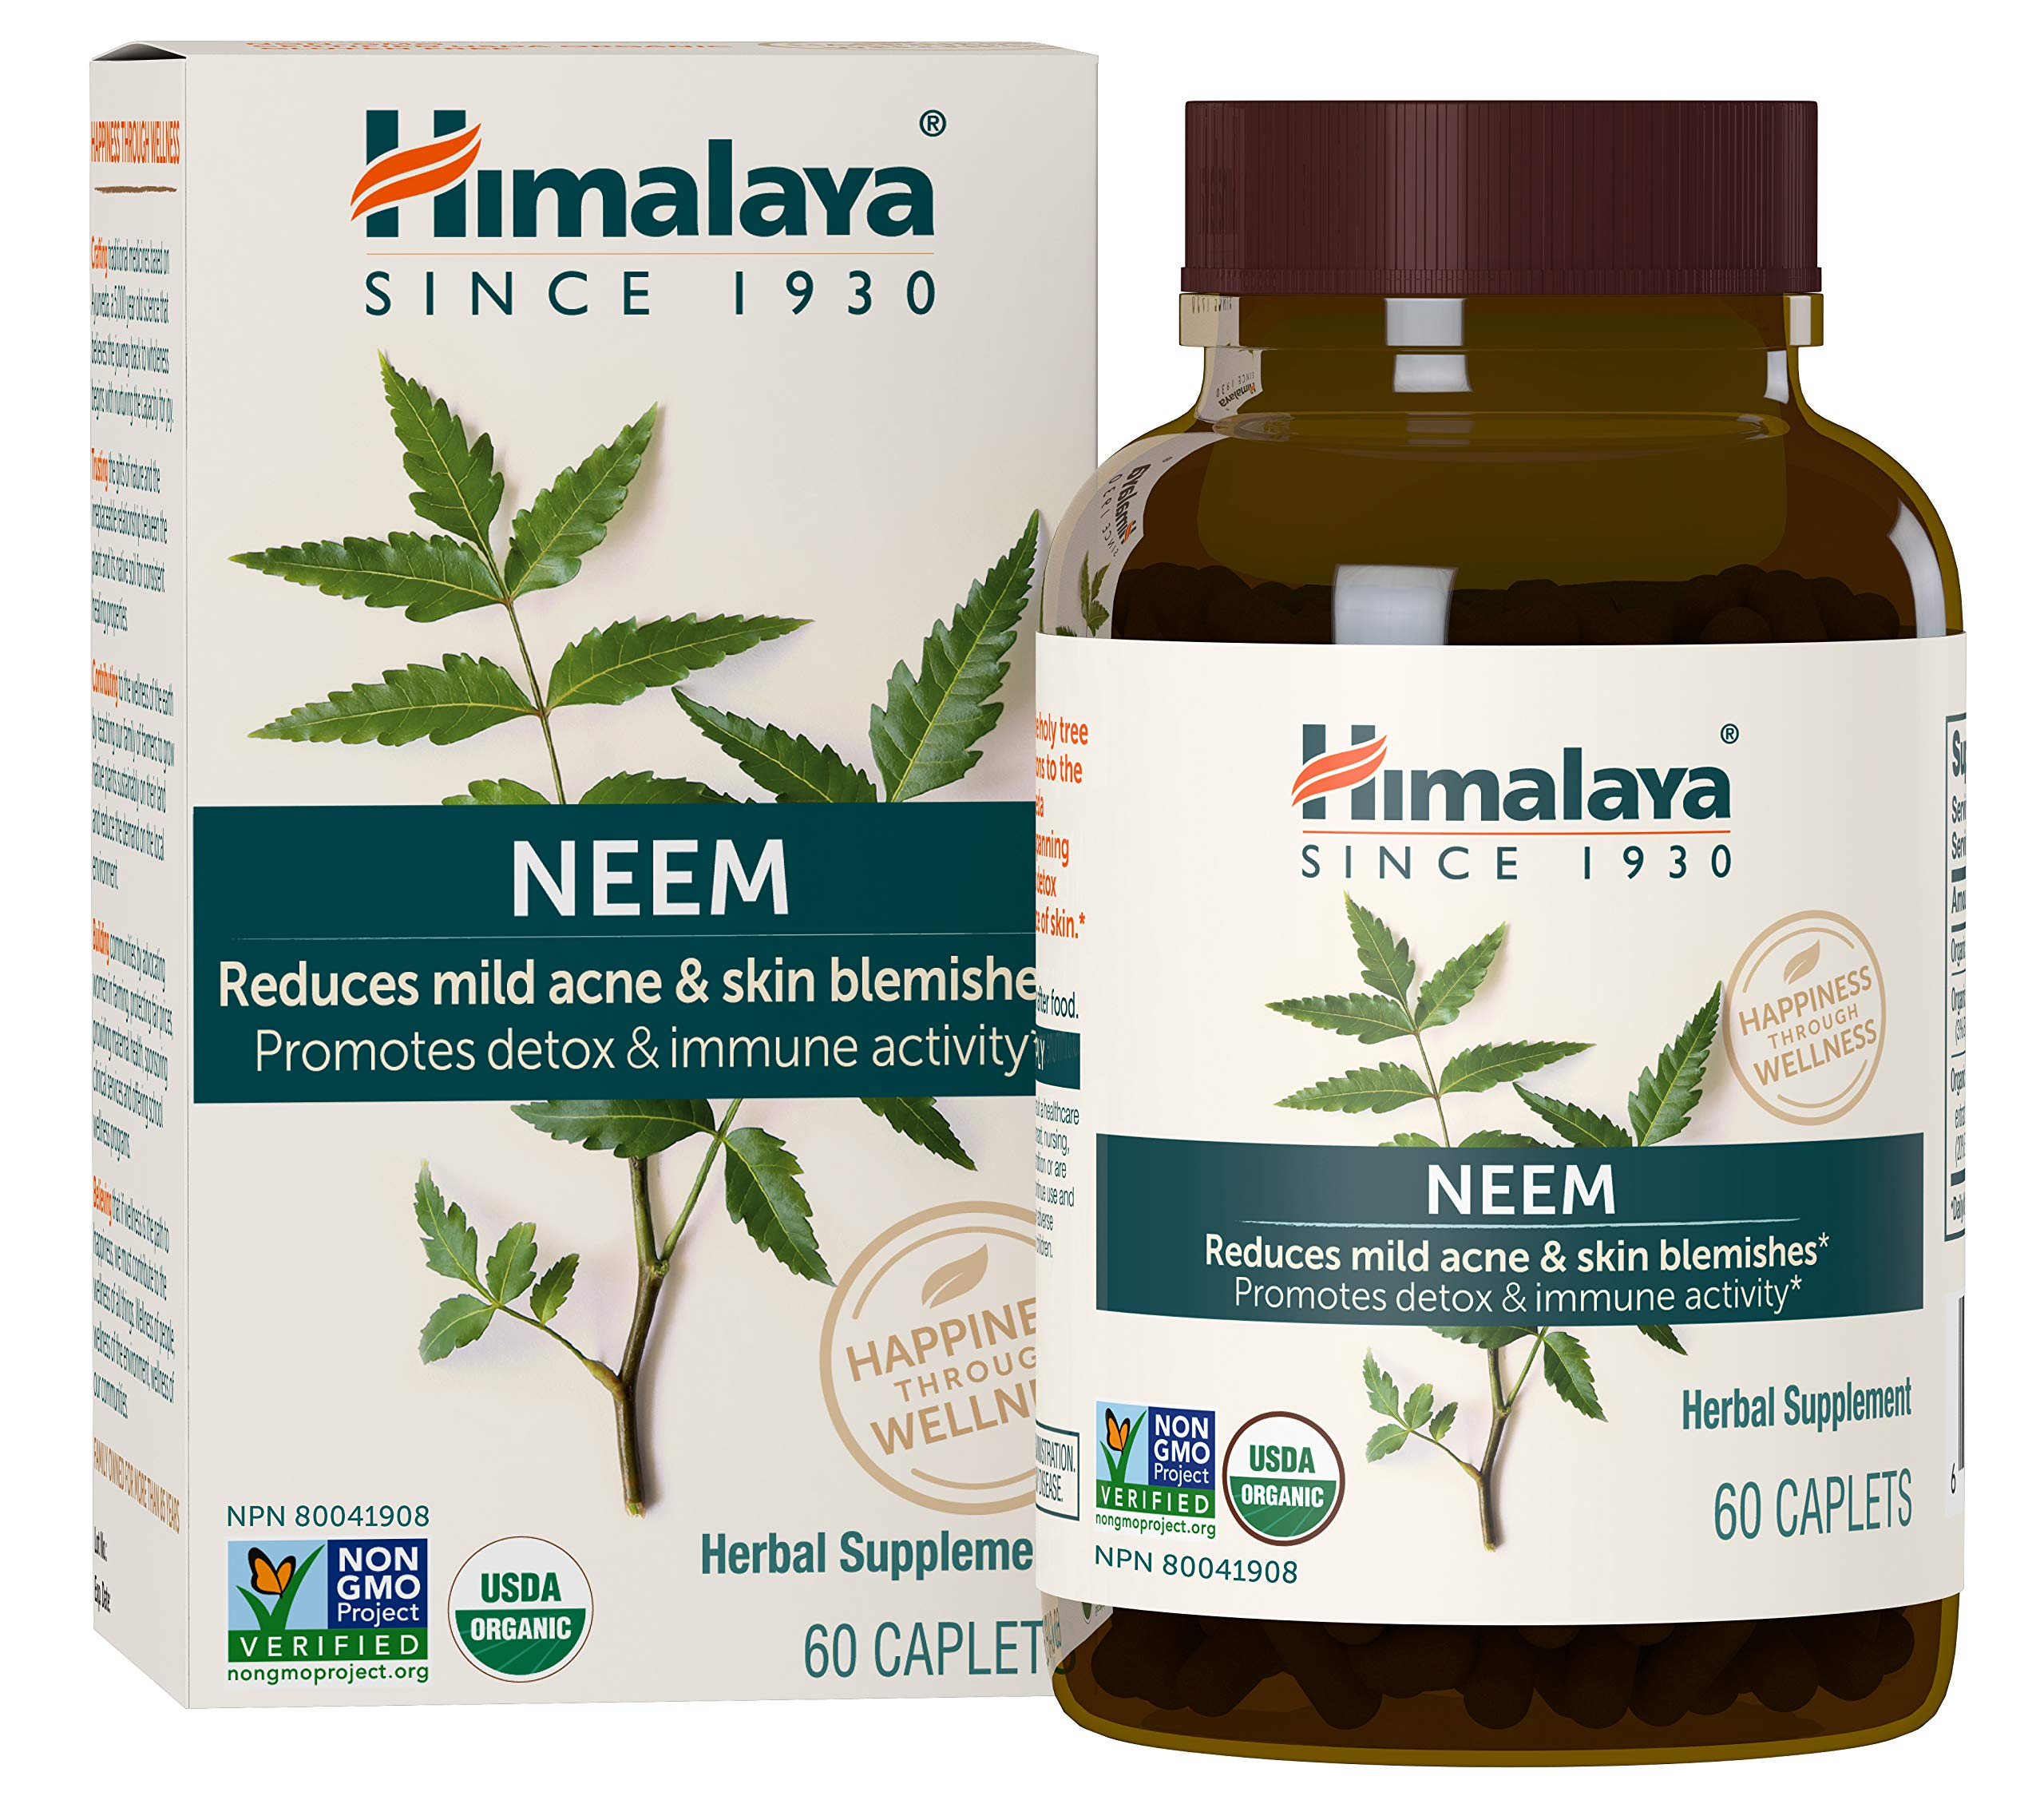 Himalaya Organic Neem 60 Caplets for Mild Acne & Healthy Skin 600mg